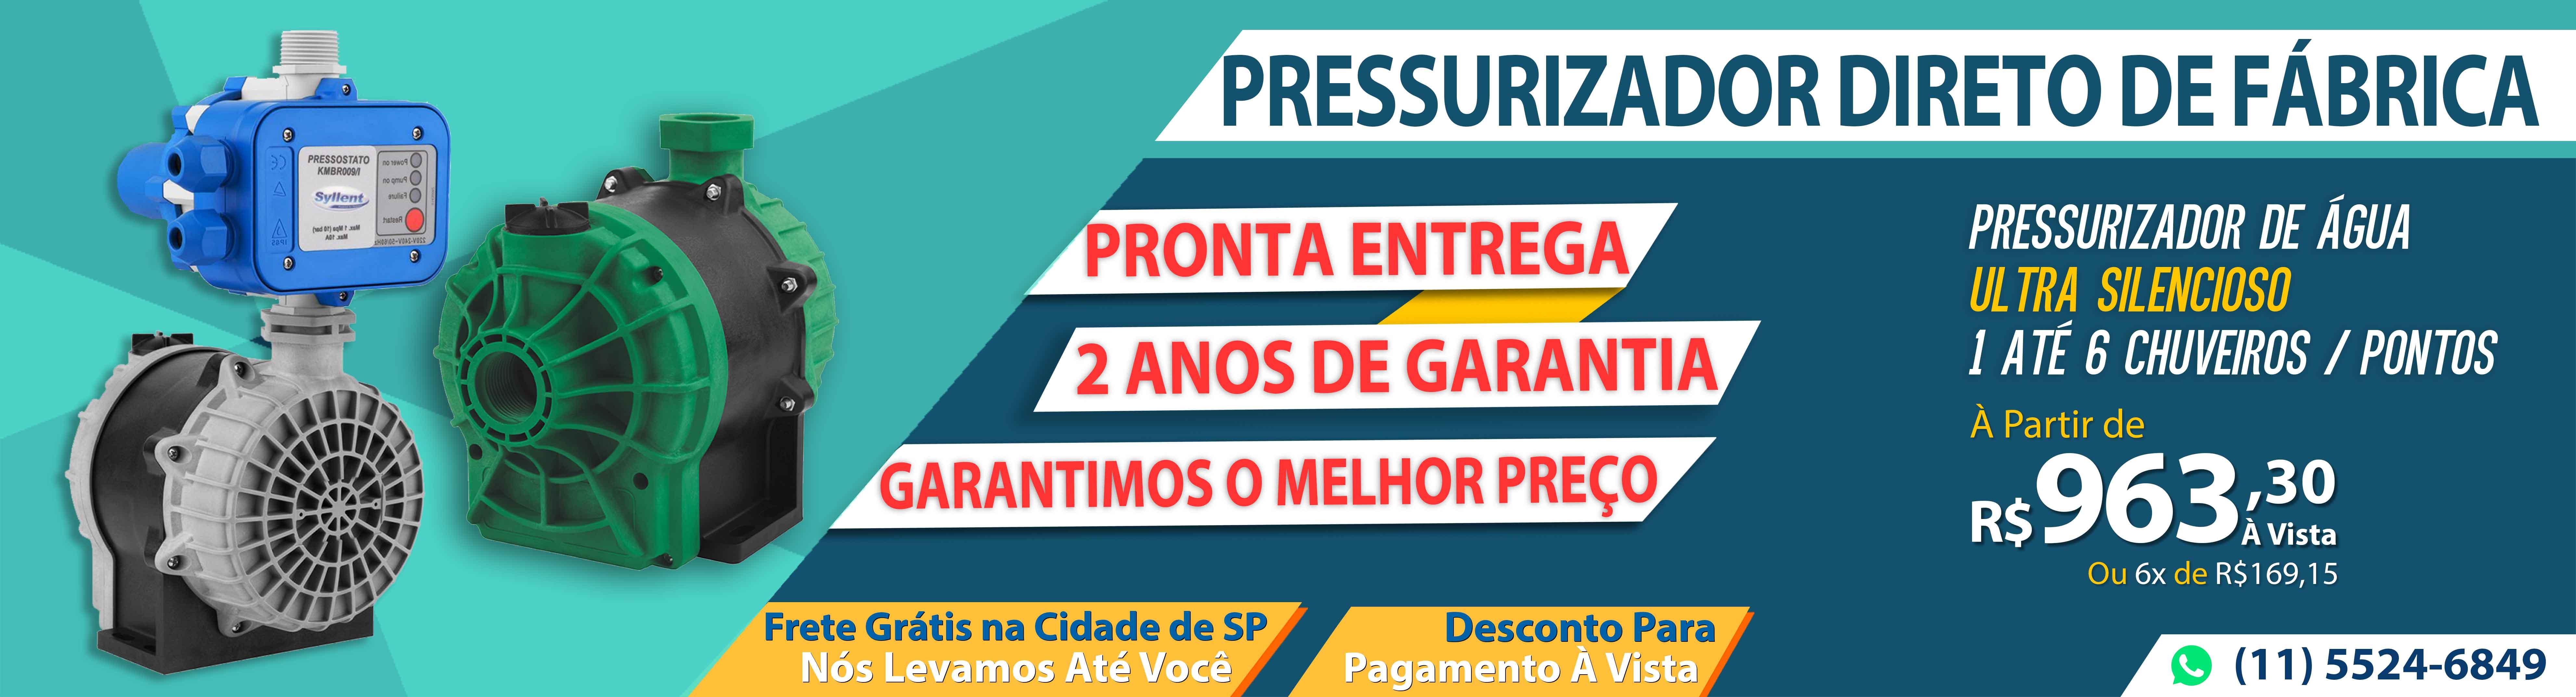 Syllent PRESS 2